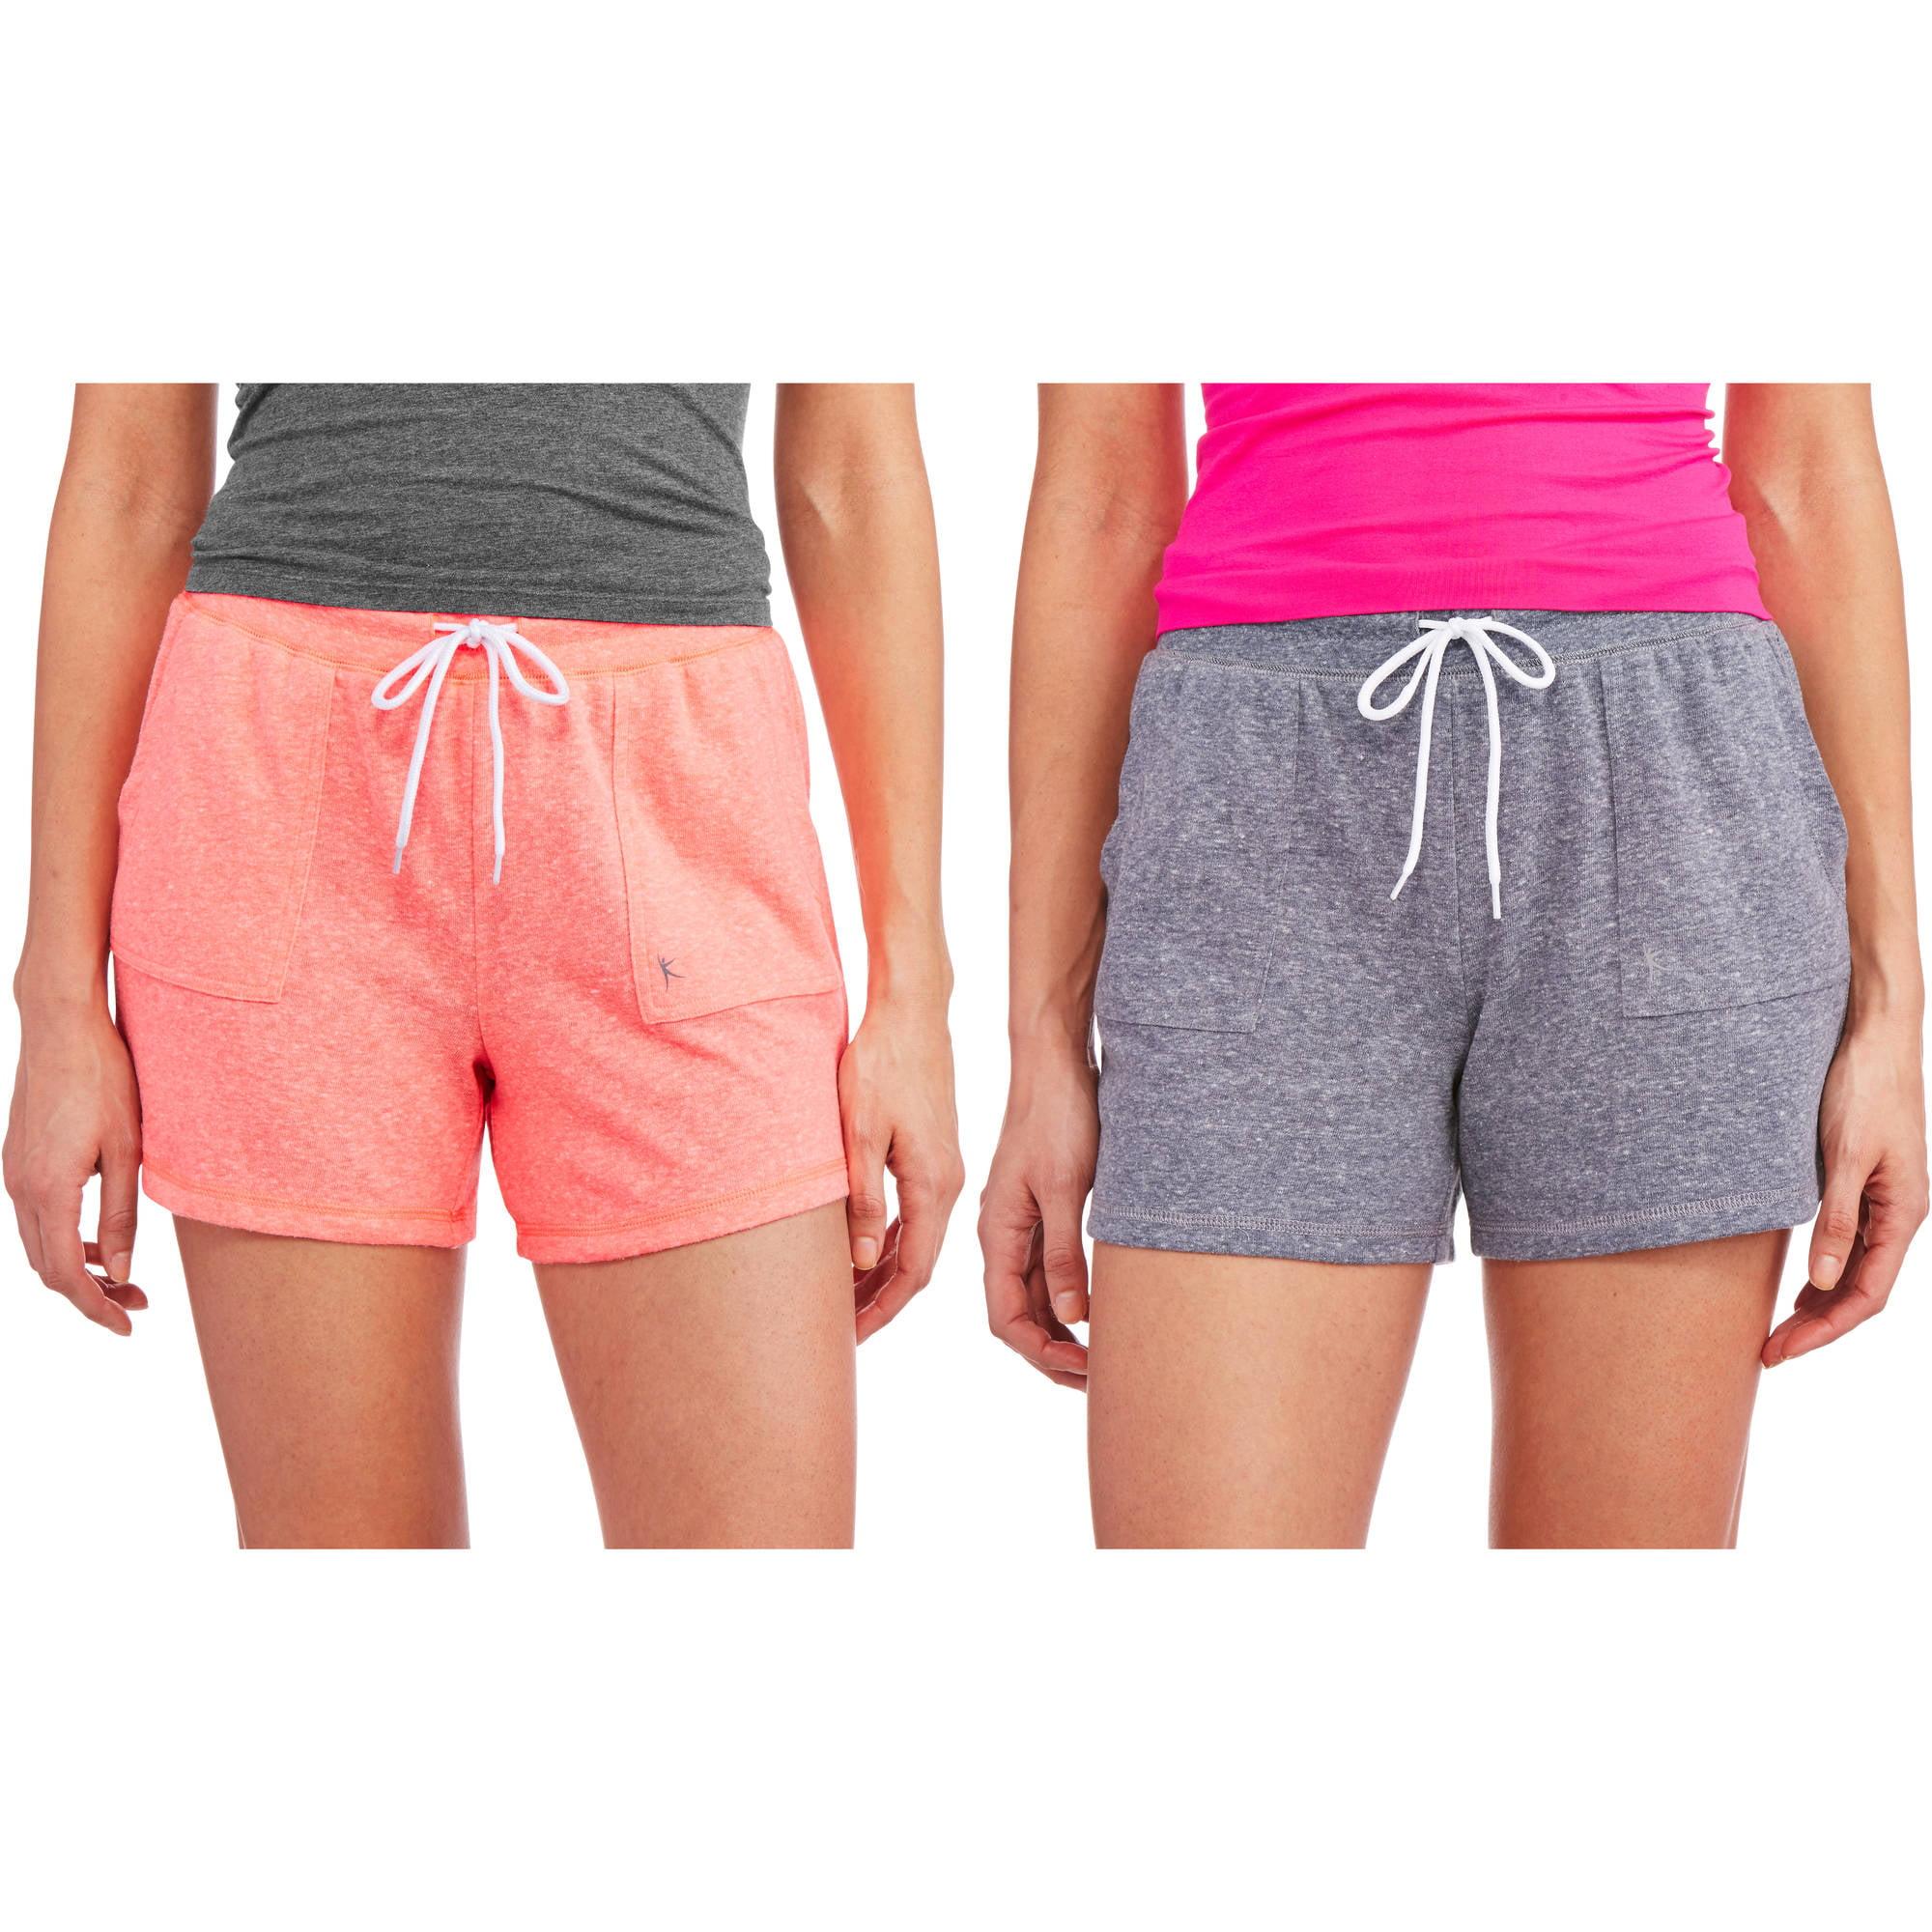 Danskin Now Women's Basic Knit Gym Short, 2 Pack Value Bundle